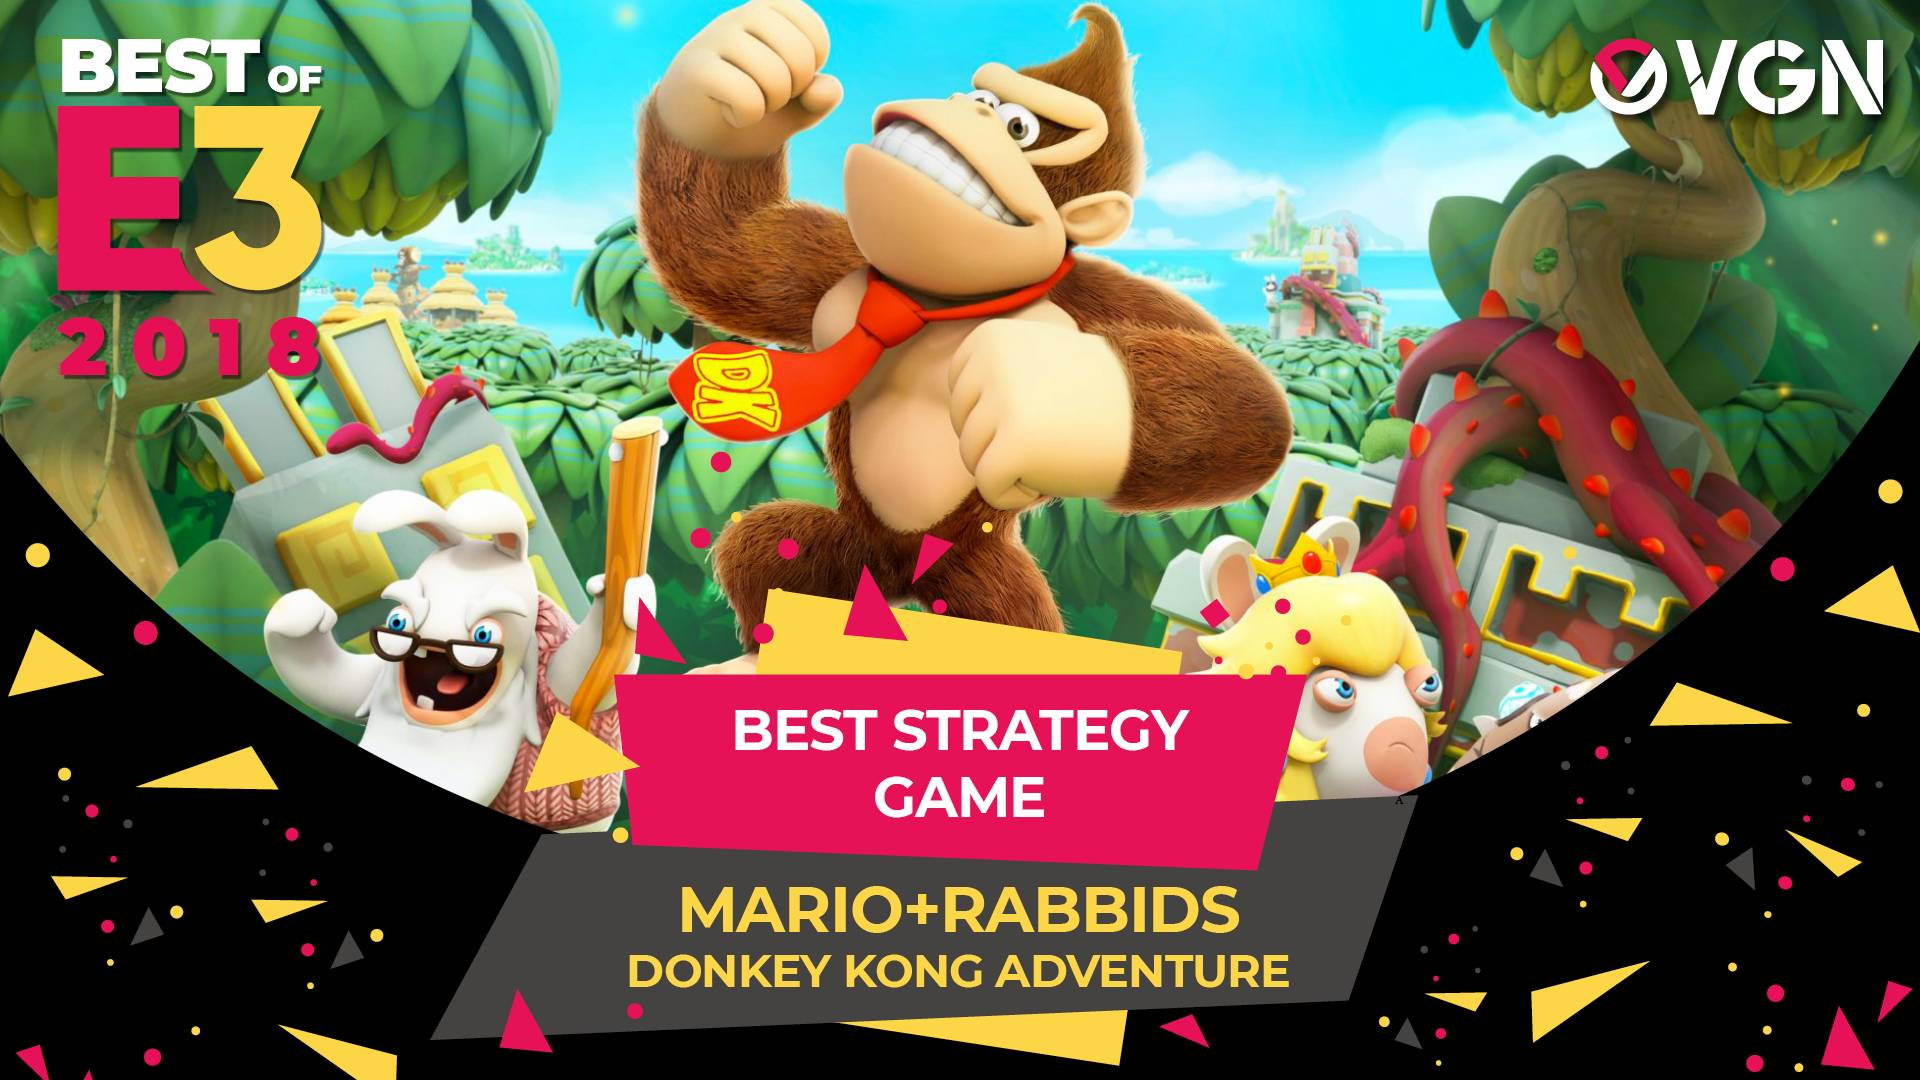 E3 2018 - Best Strategy Game - Mario Rabbids Donkey Kong Adventure